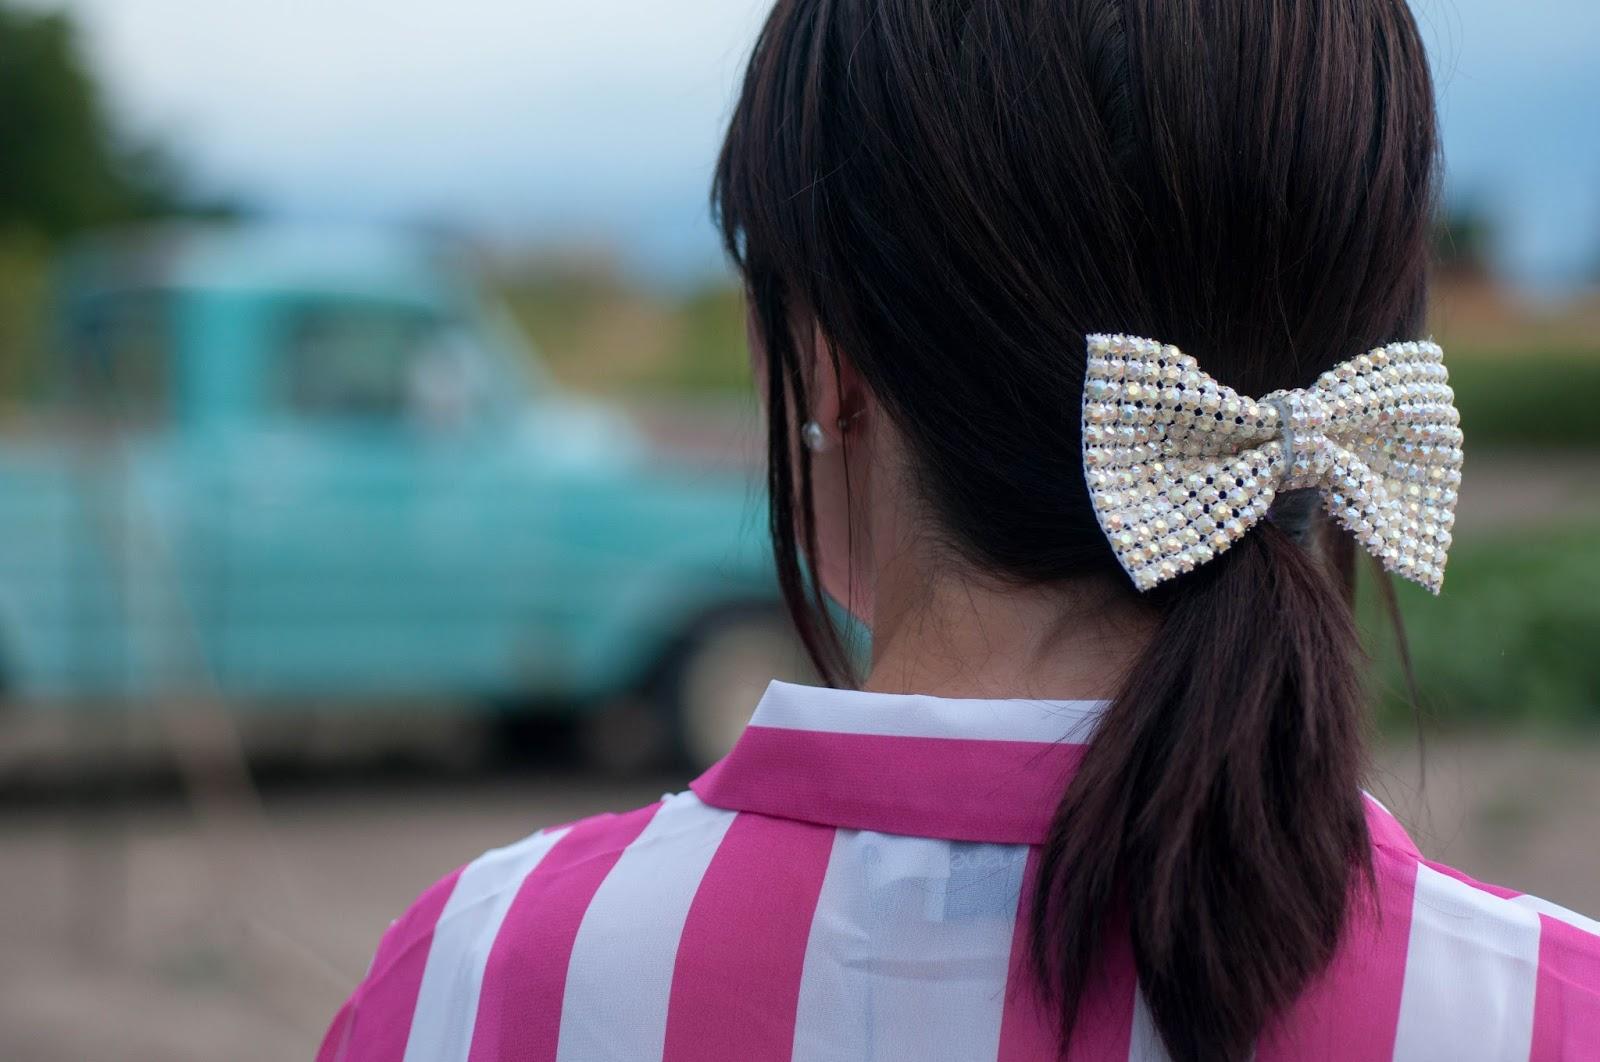 ootd details, rhinestone bow, hair clip, hair bow, vintage truck, candy stripe shirt, asos top